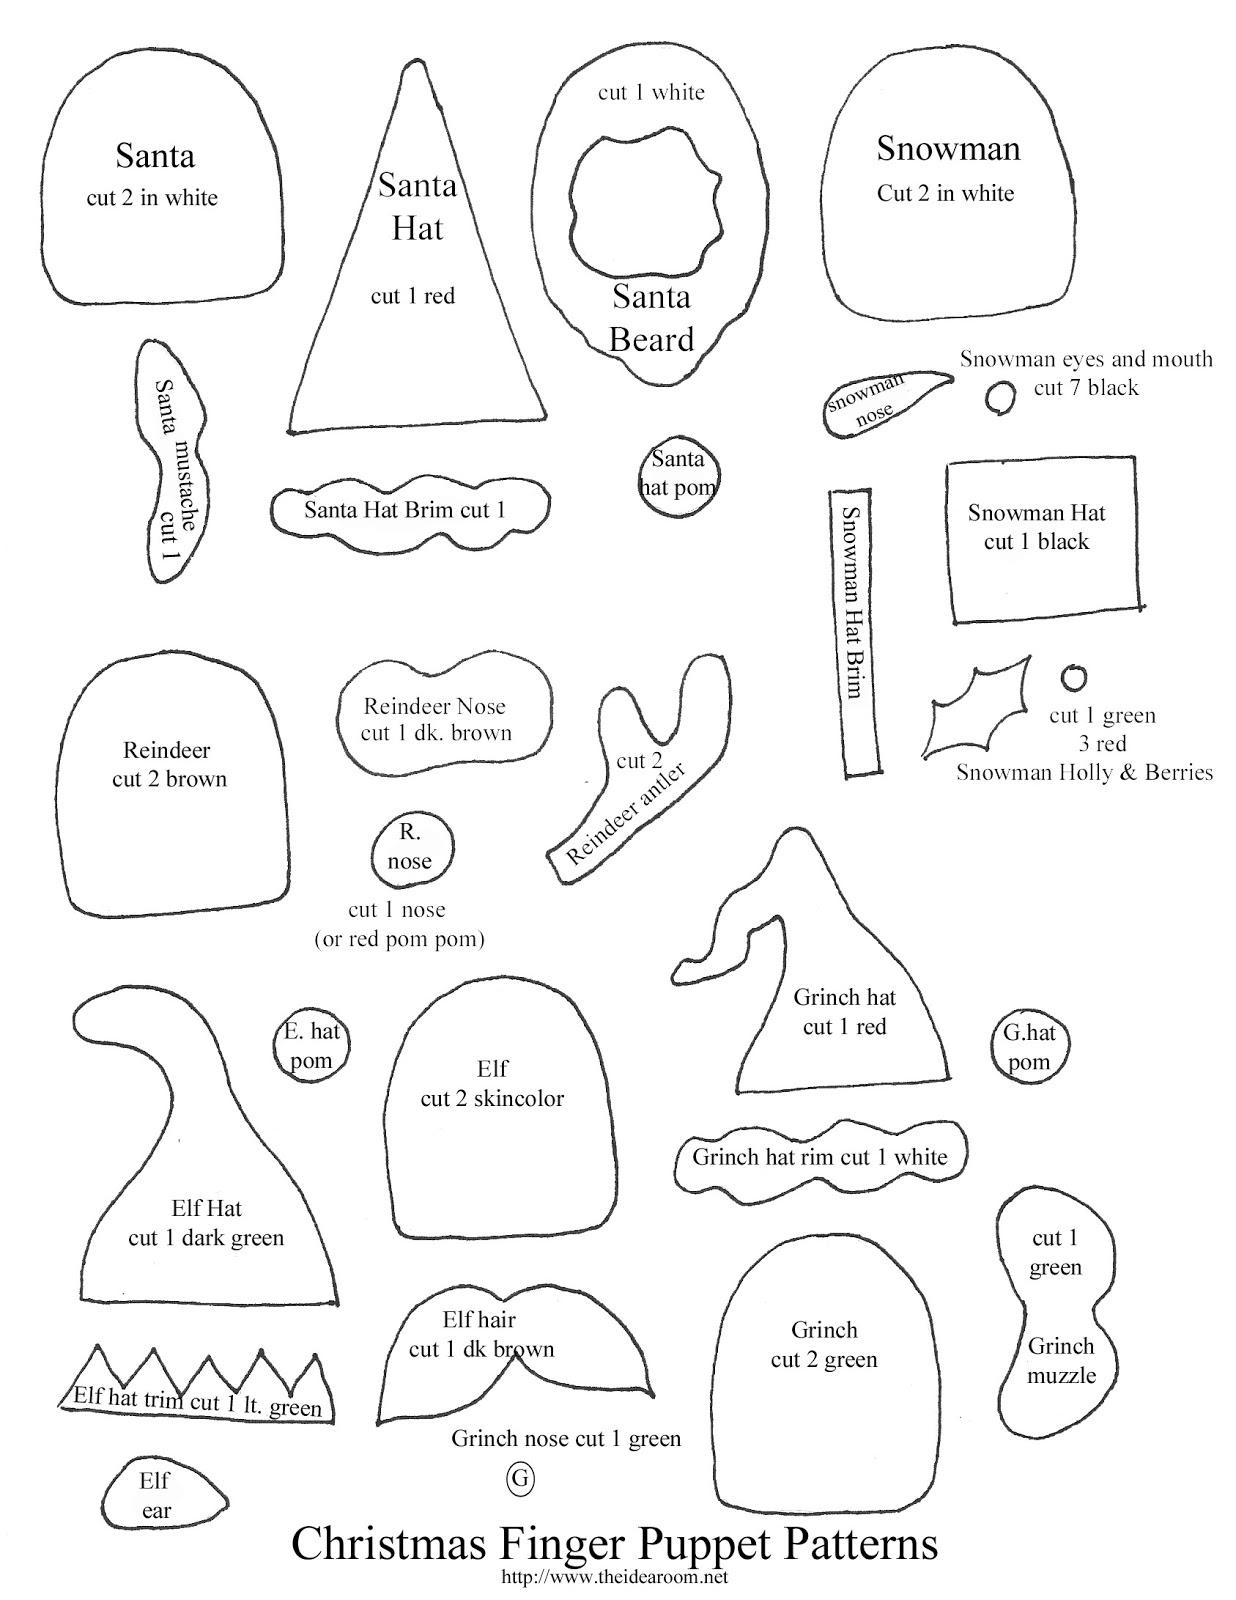 areka tarjeteria espanola nail art y otras manualidades